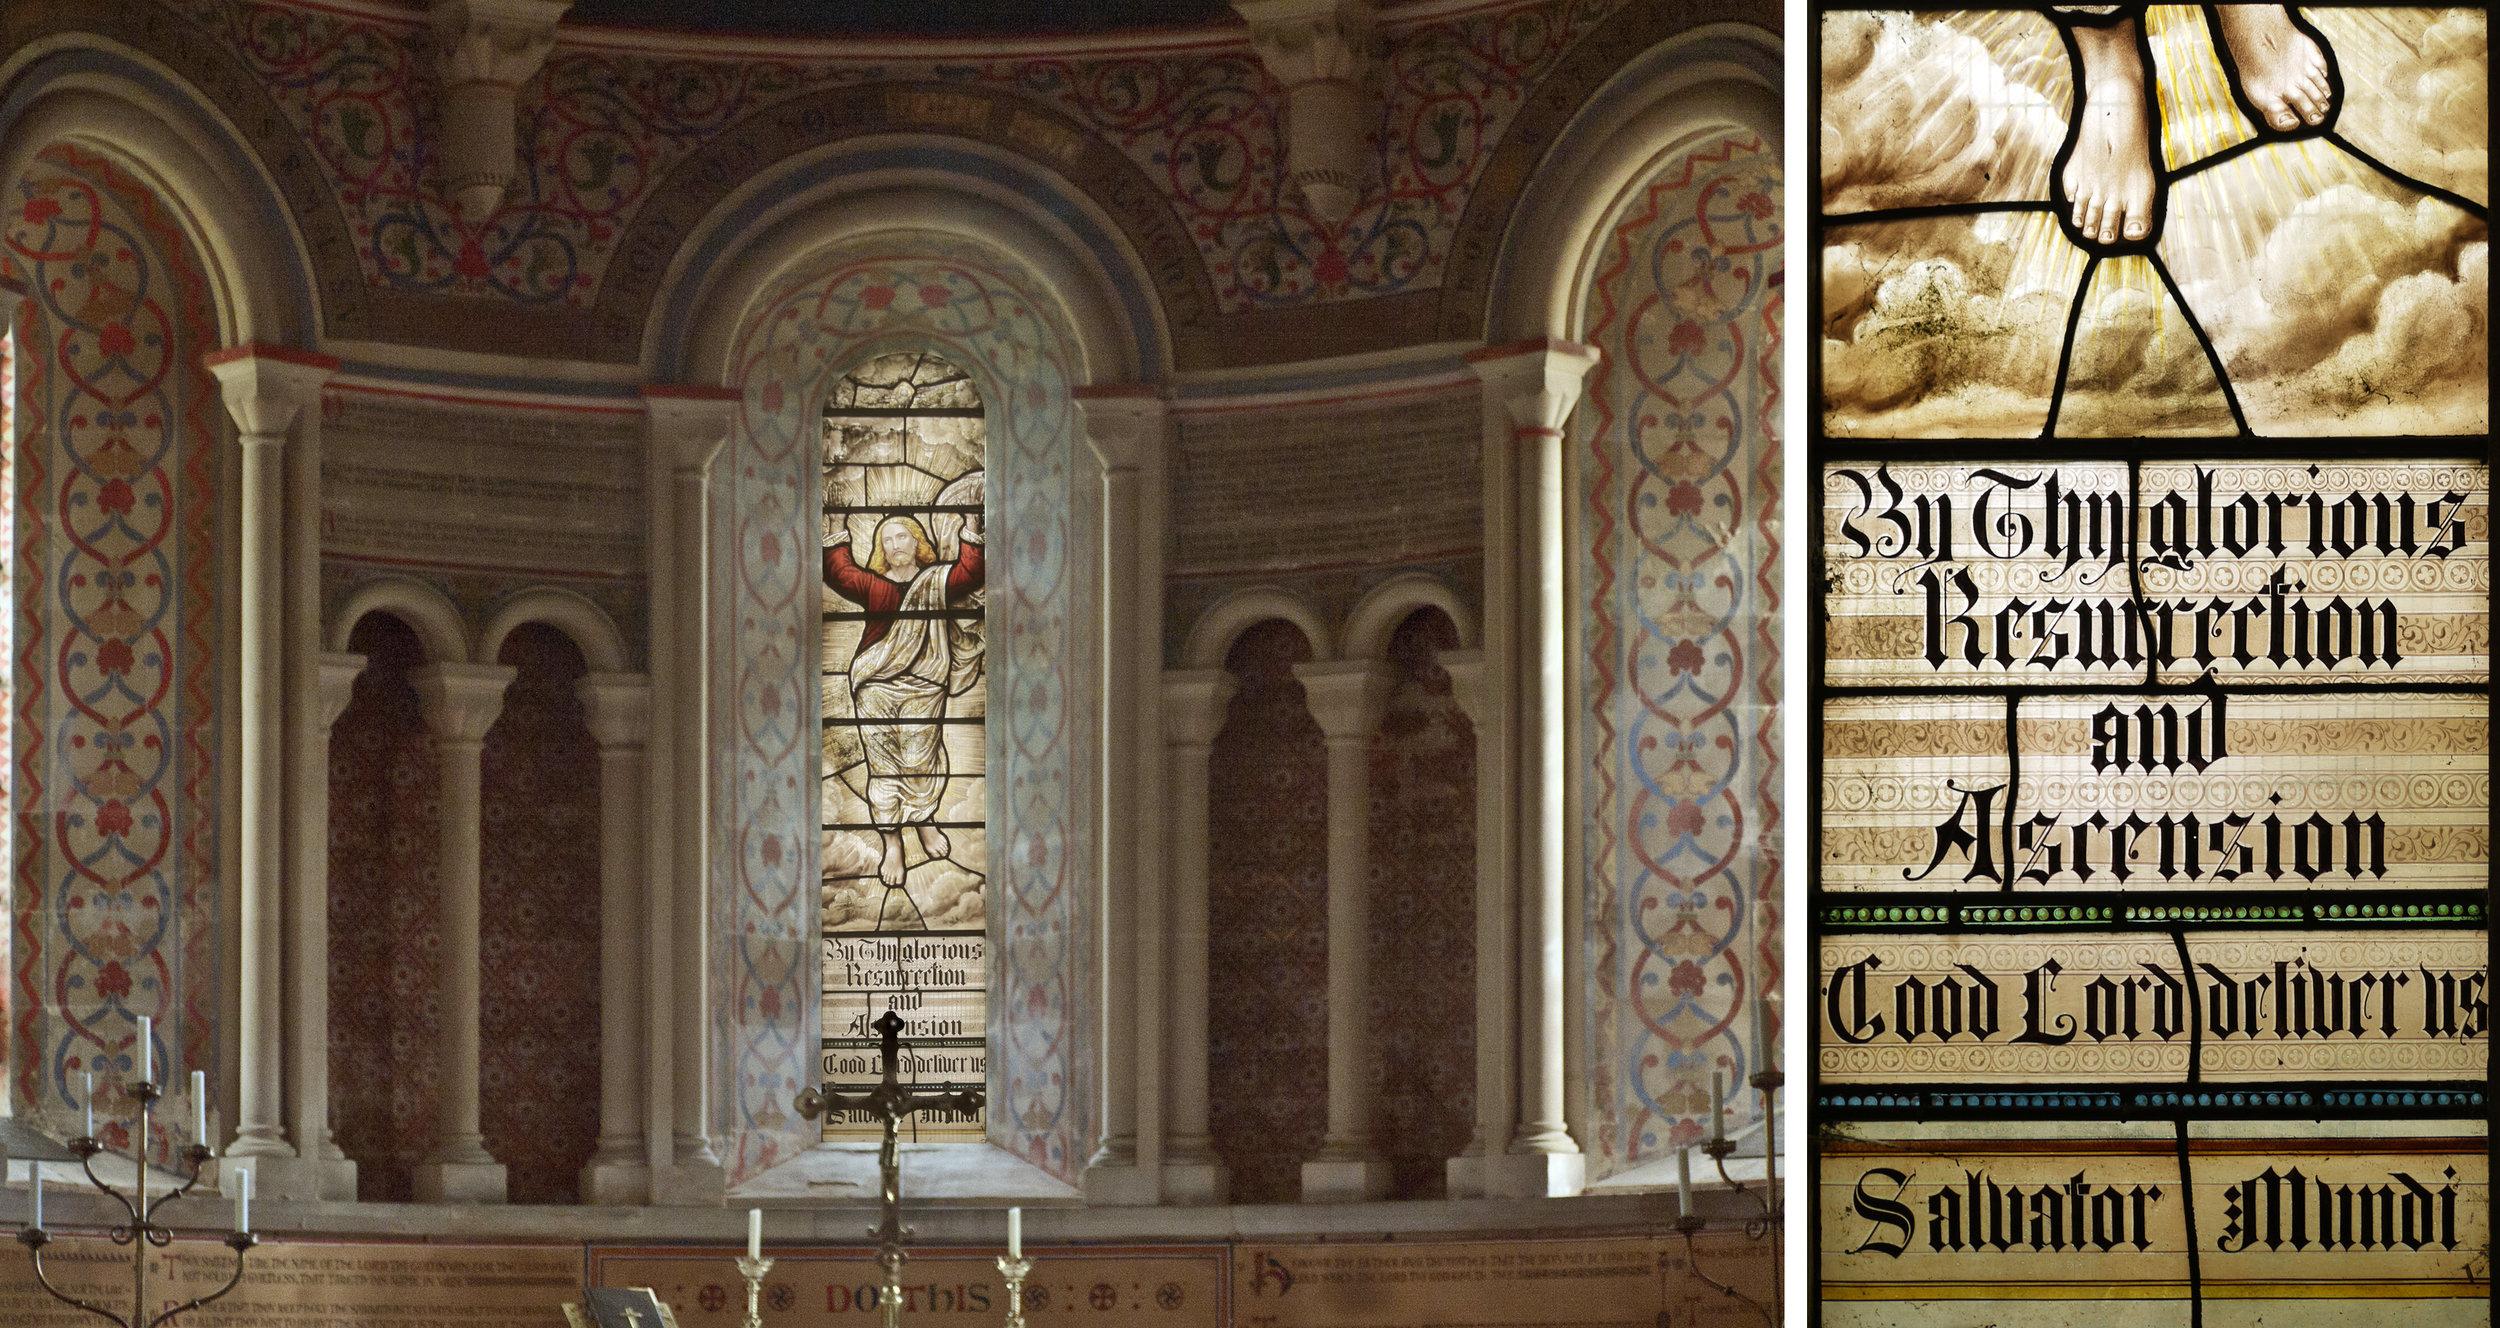 Central window, Christ resurrected & detail, HB&B 1888